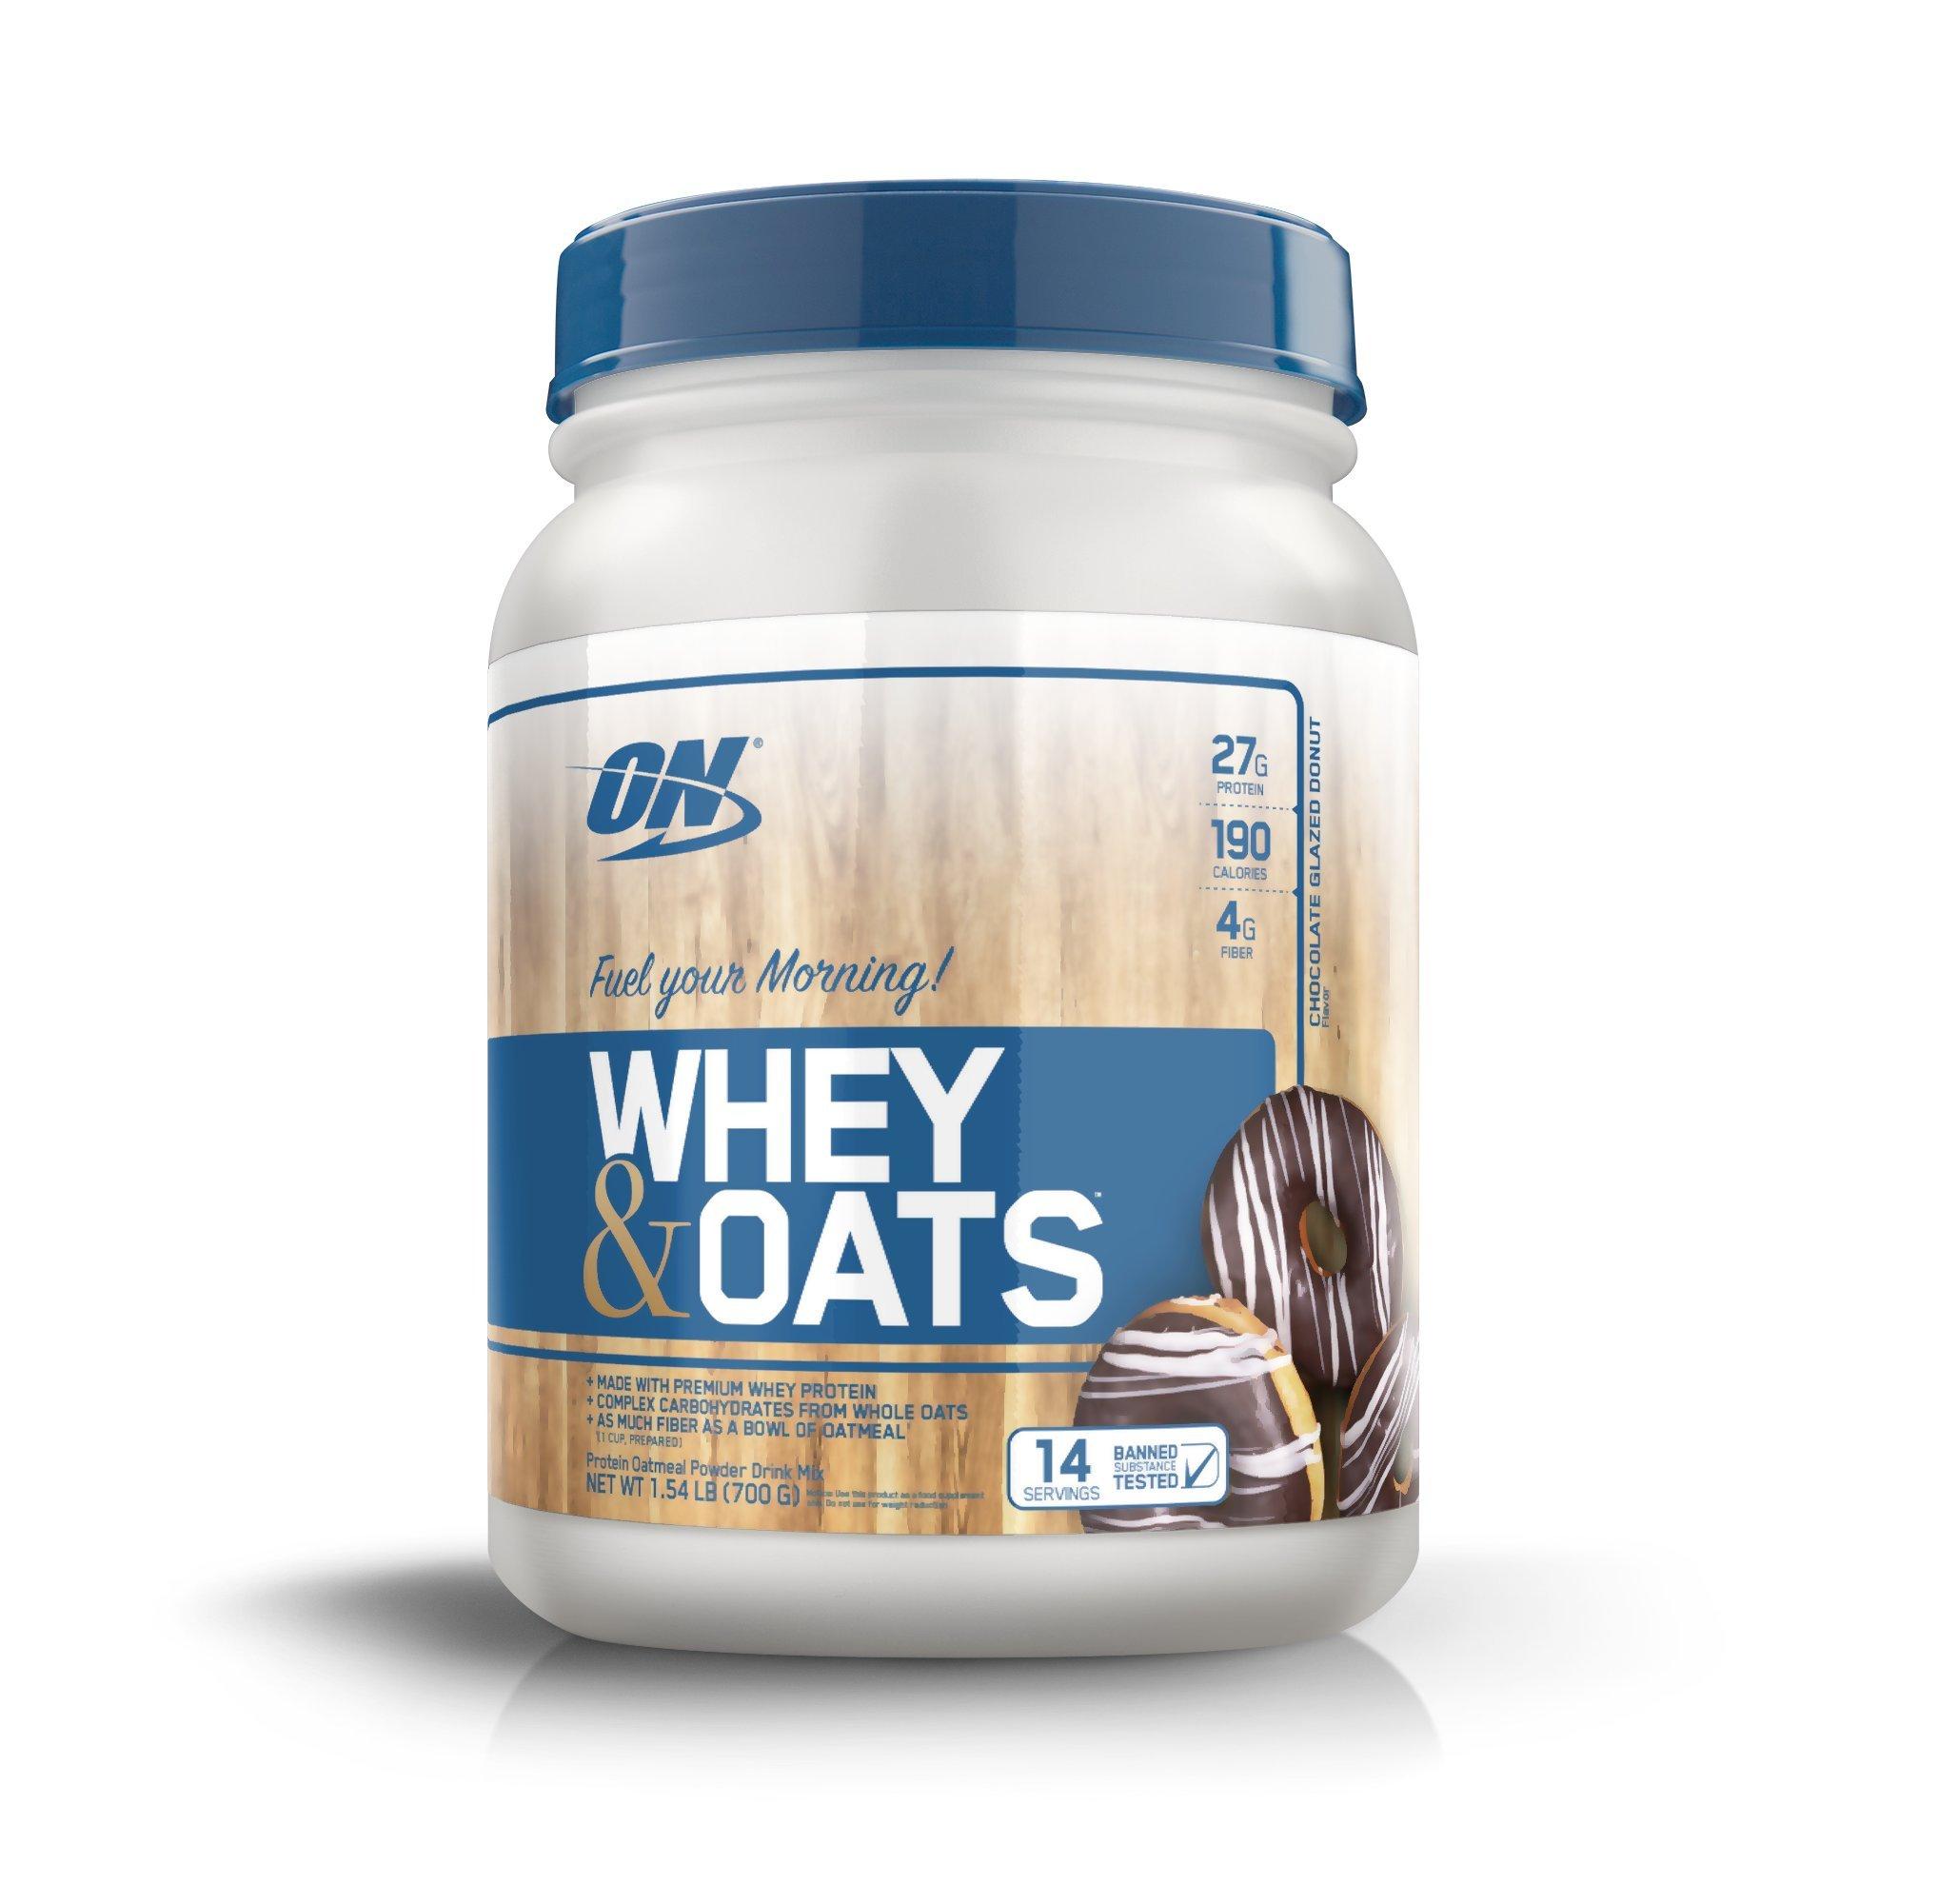 Protein Shaker Optimum Nutrition: OPTIMUM NUTRITION Whey & Oats Protein Powder, Breakfast Or